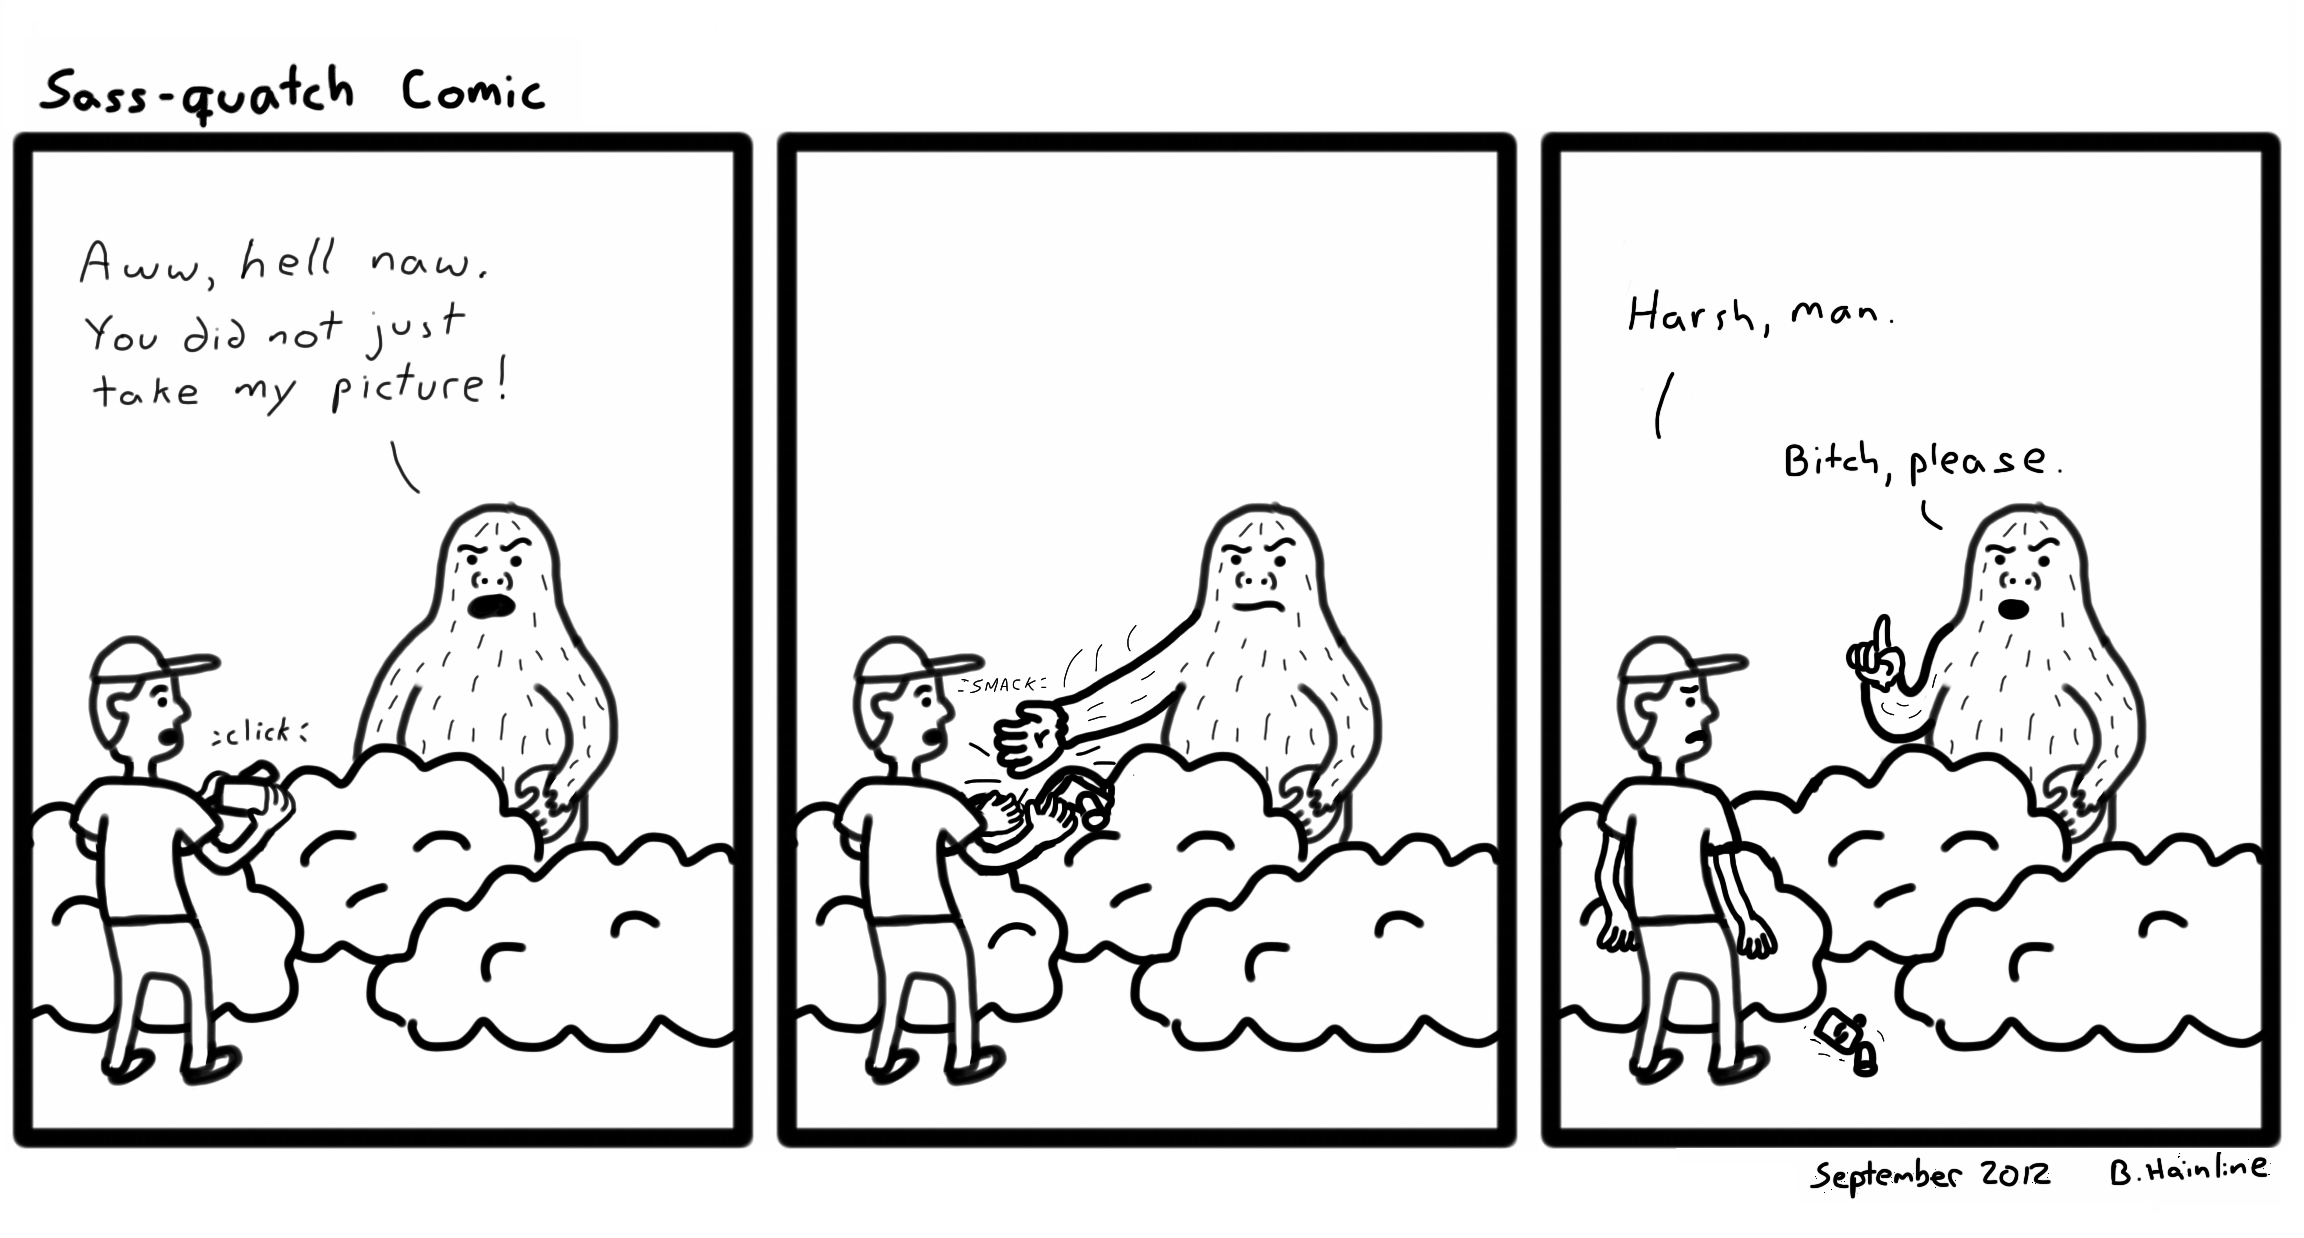 Sass-quatch Comic